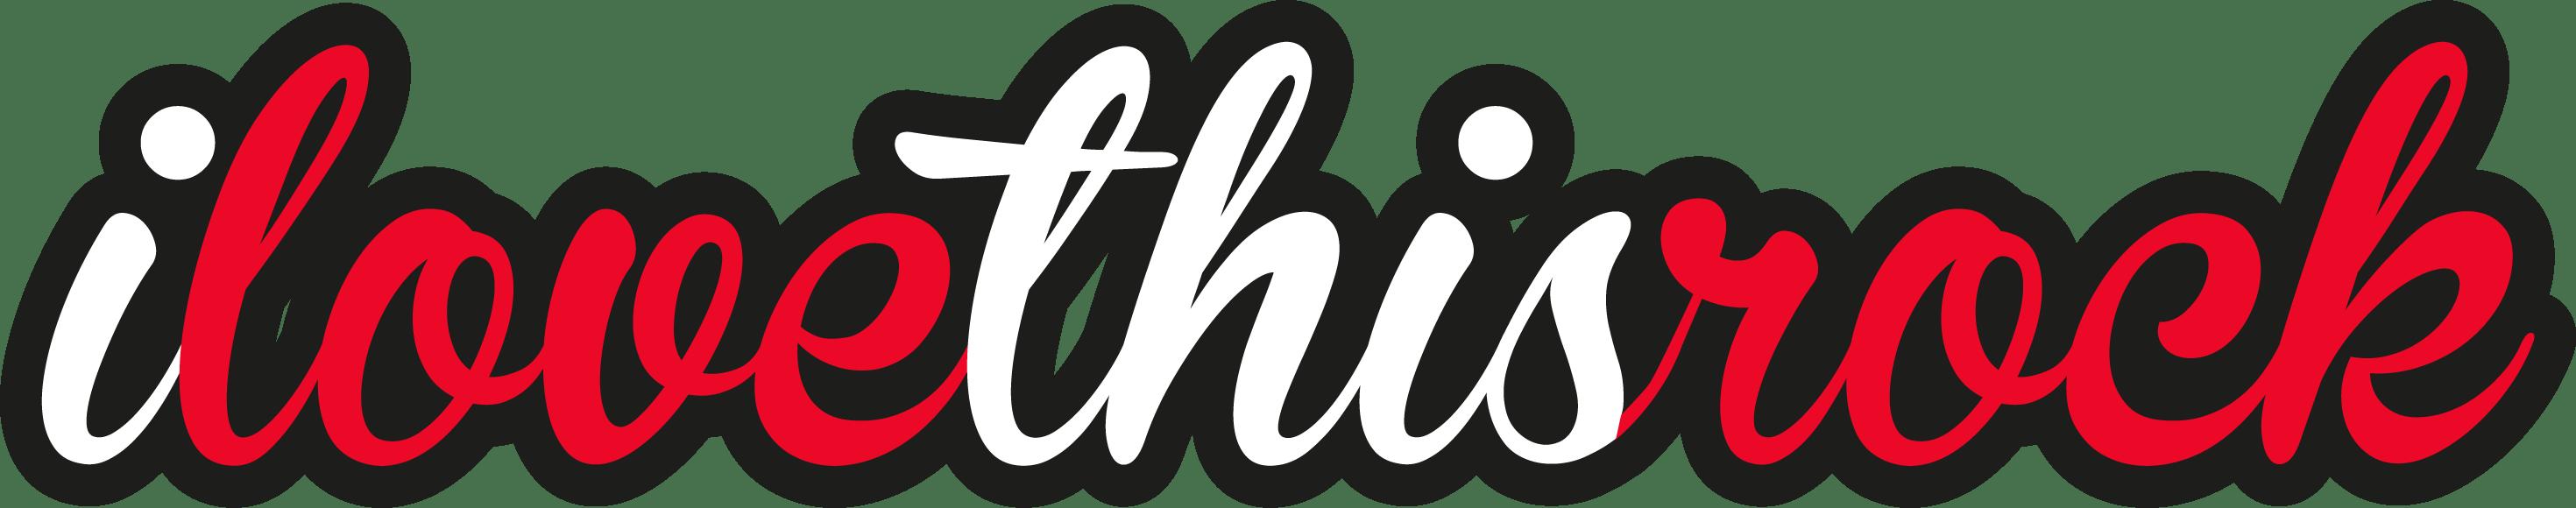 logo-black-outline